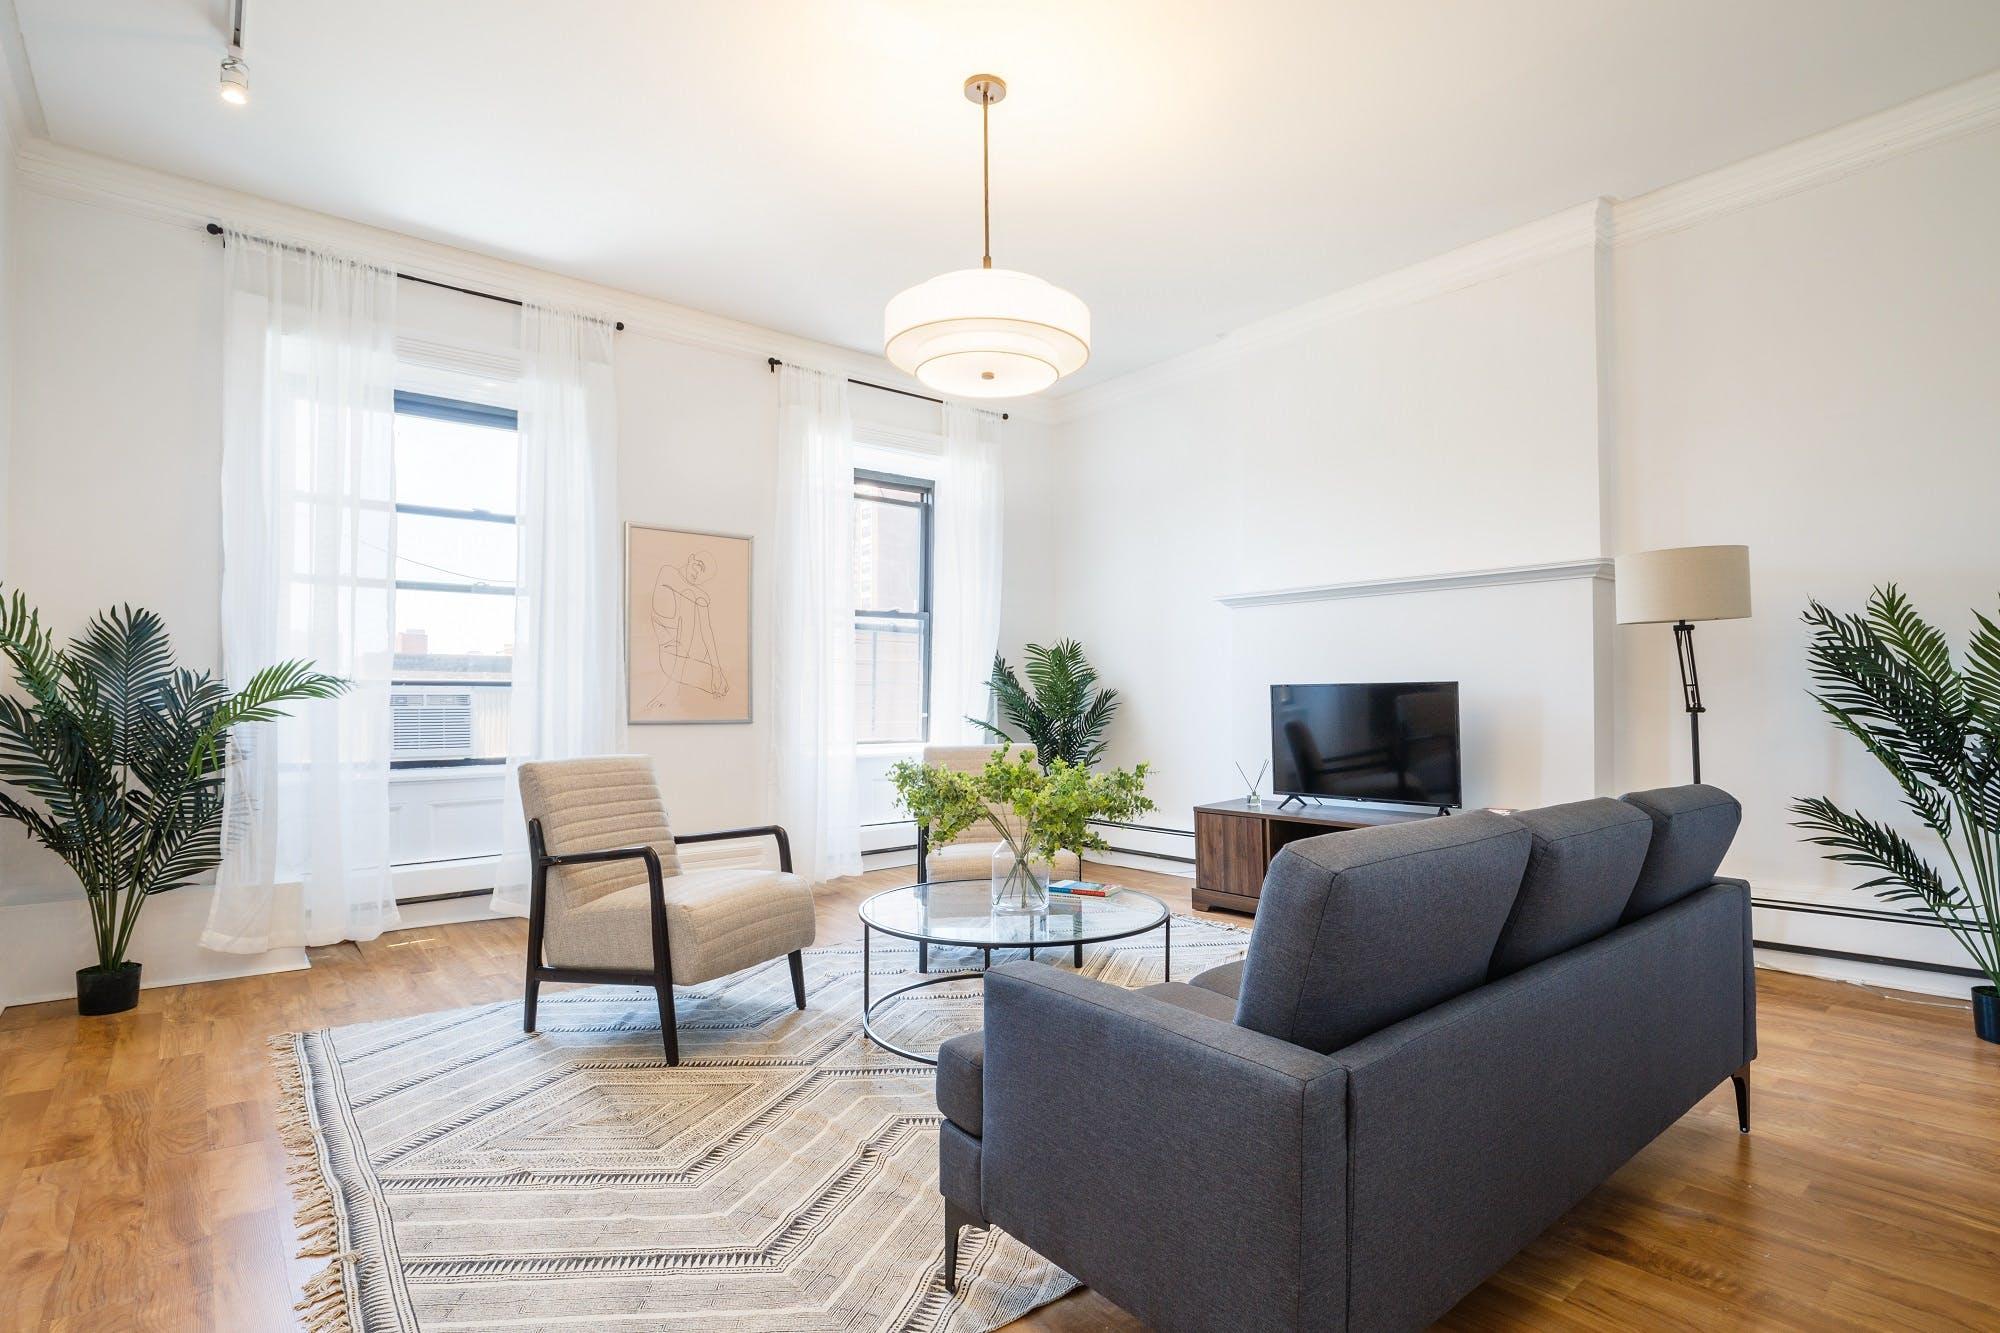 8 Residents   135th St. - Central Harlem   Minimalist Styled Apt.